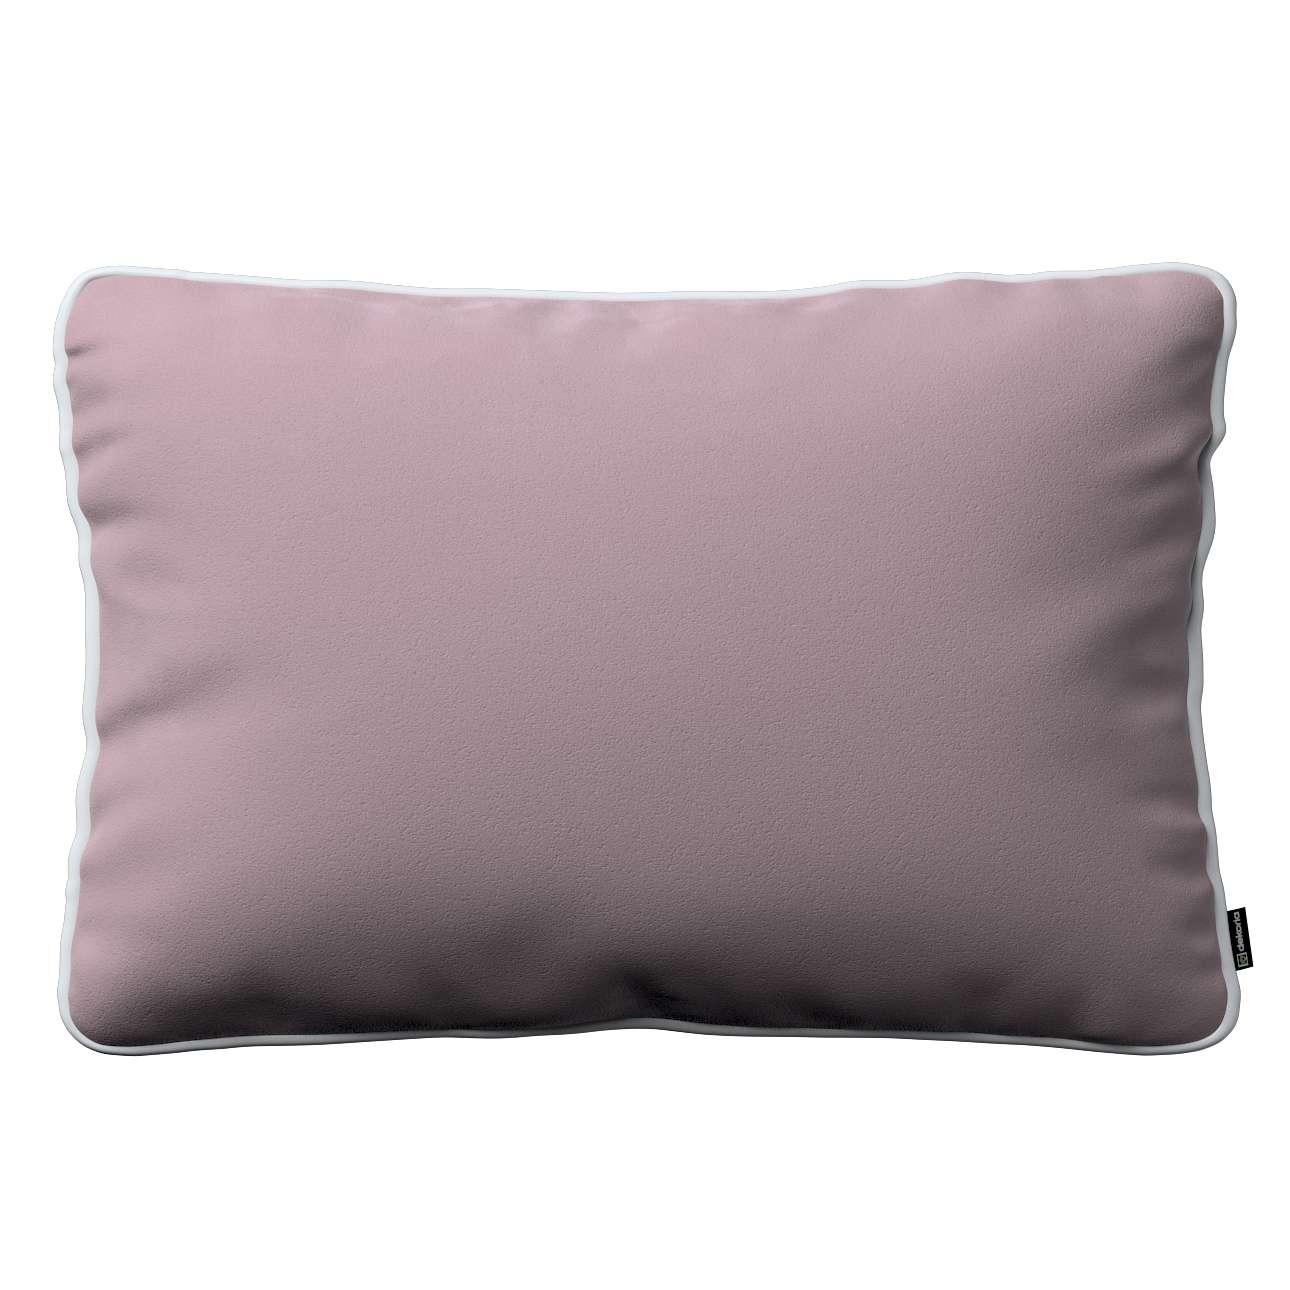 kissenh lle laura 40 x 60 cm rosa 60 40 cm velvet modecentren imc. Black Bedroom Furniture Sets. Home Design Ideas